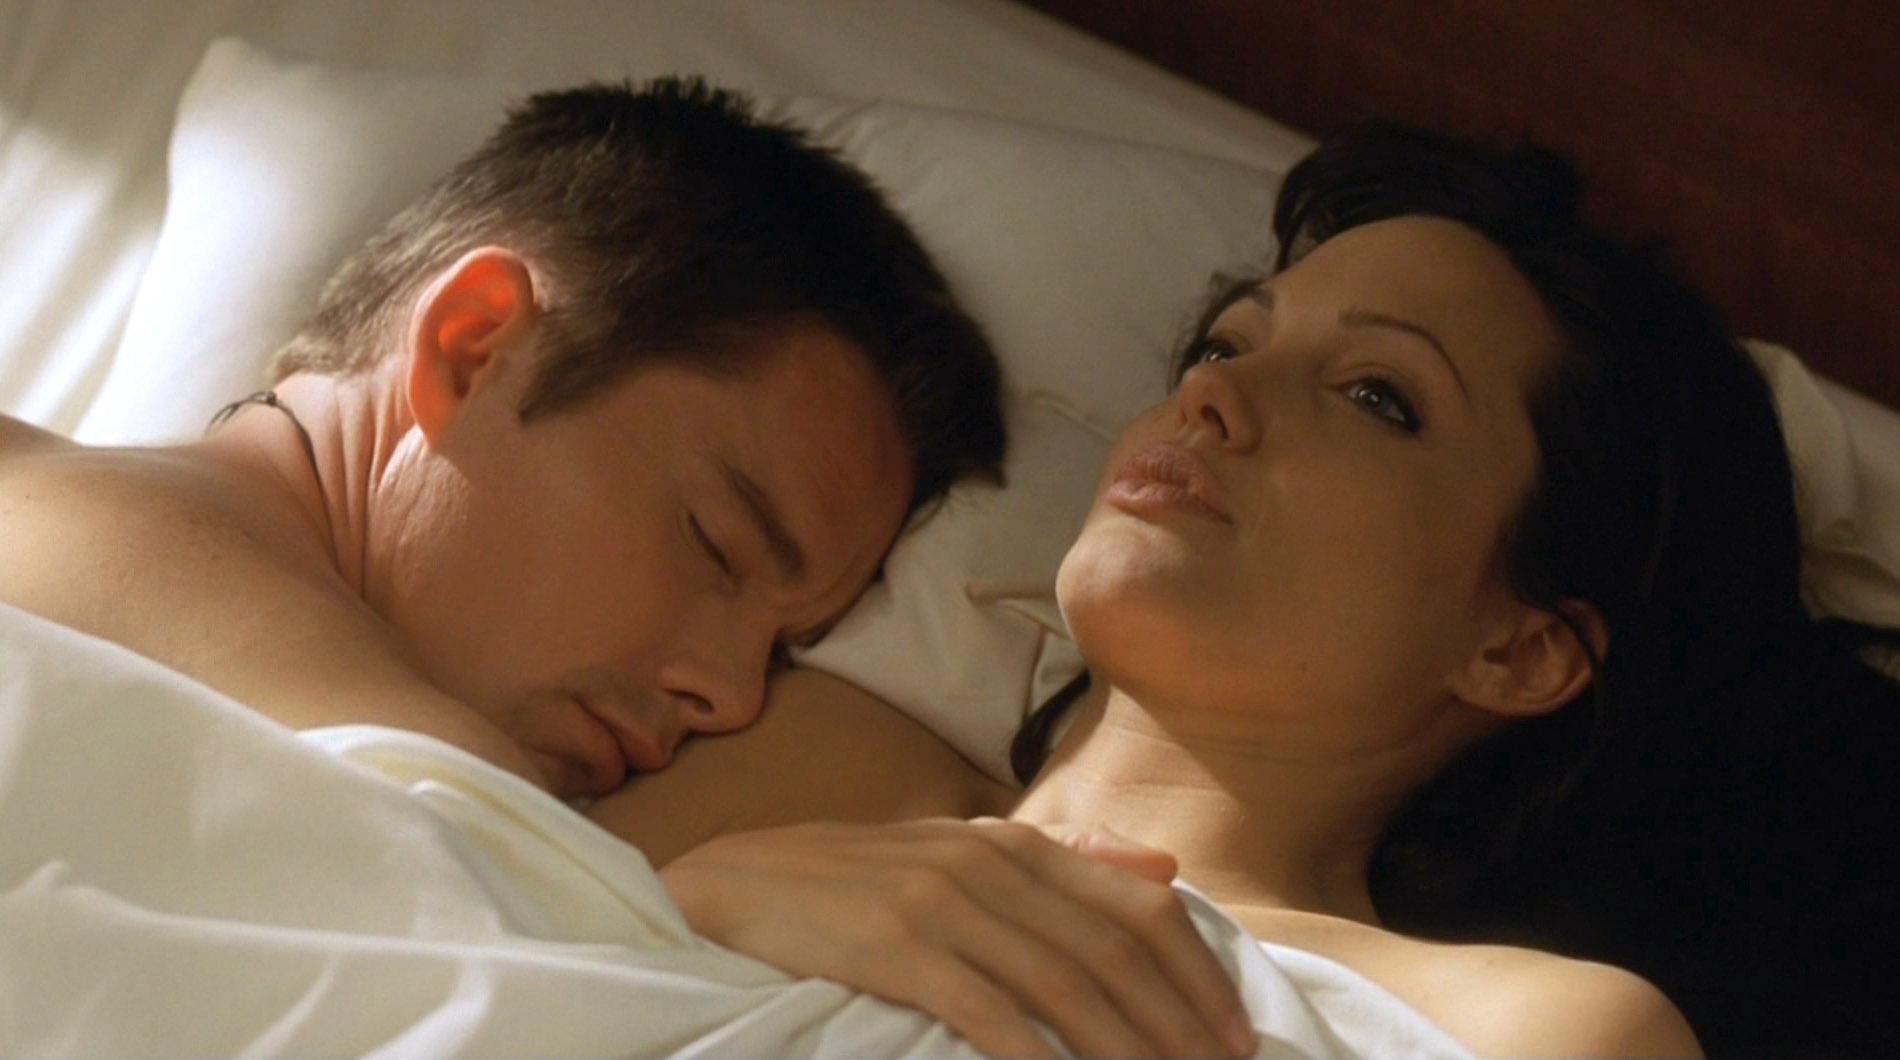 erotik sexfilm massage anu